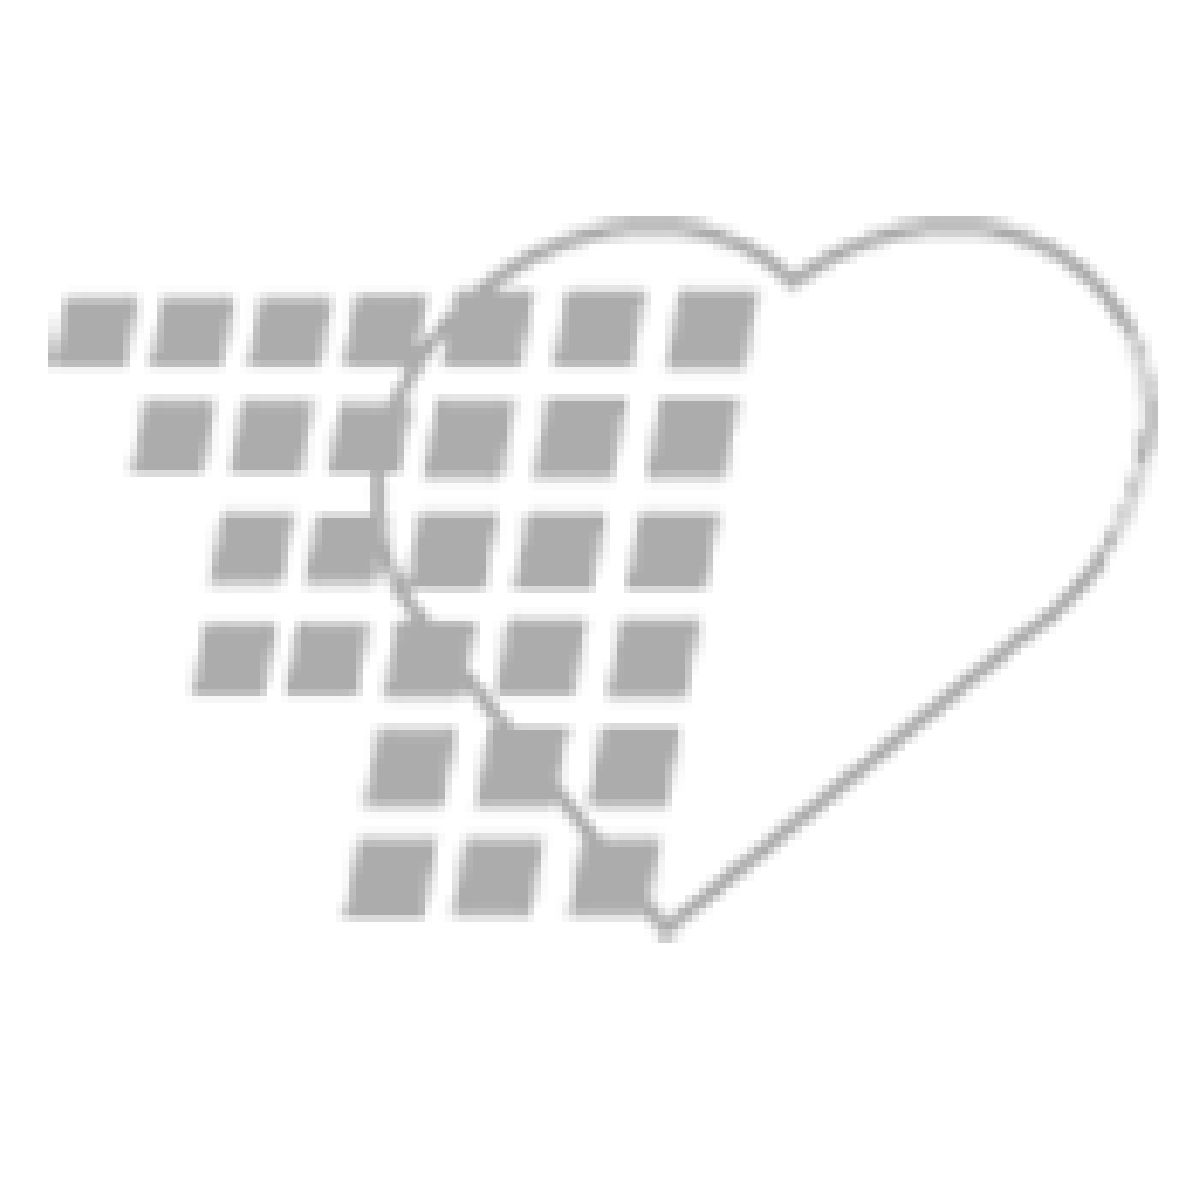 06-93-0707 Demo Dose® Phenyton Sodim (Dilantn) 100mg capsule UD - 100 Pills/Box